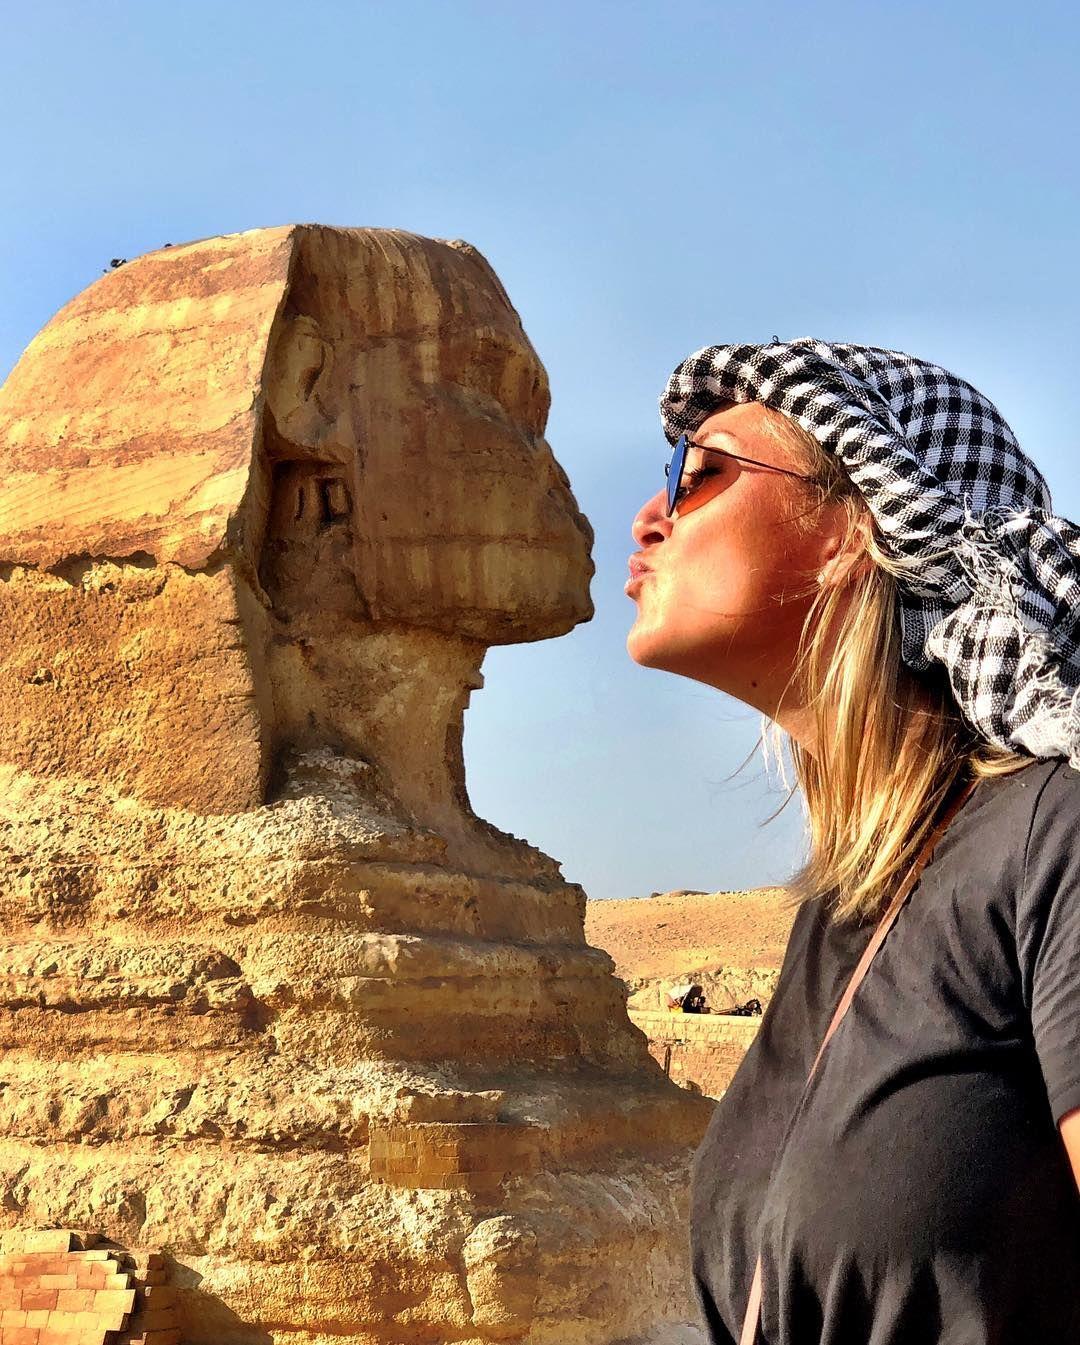 Egypt Tours 2020 2021 Special Deals Holidays Calendar 2020 2021 2022 Egypt Tours Visit Egypt Egypt